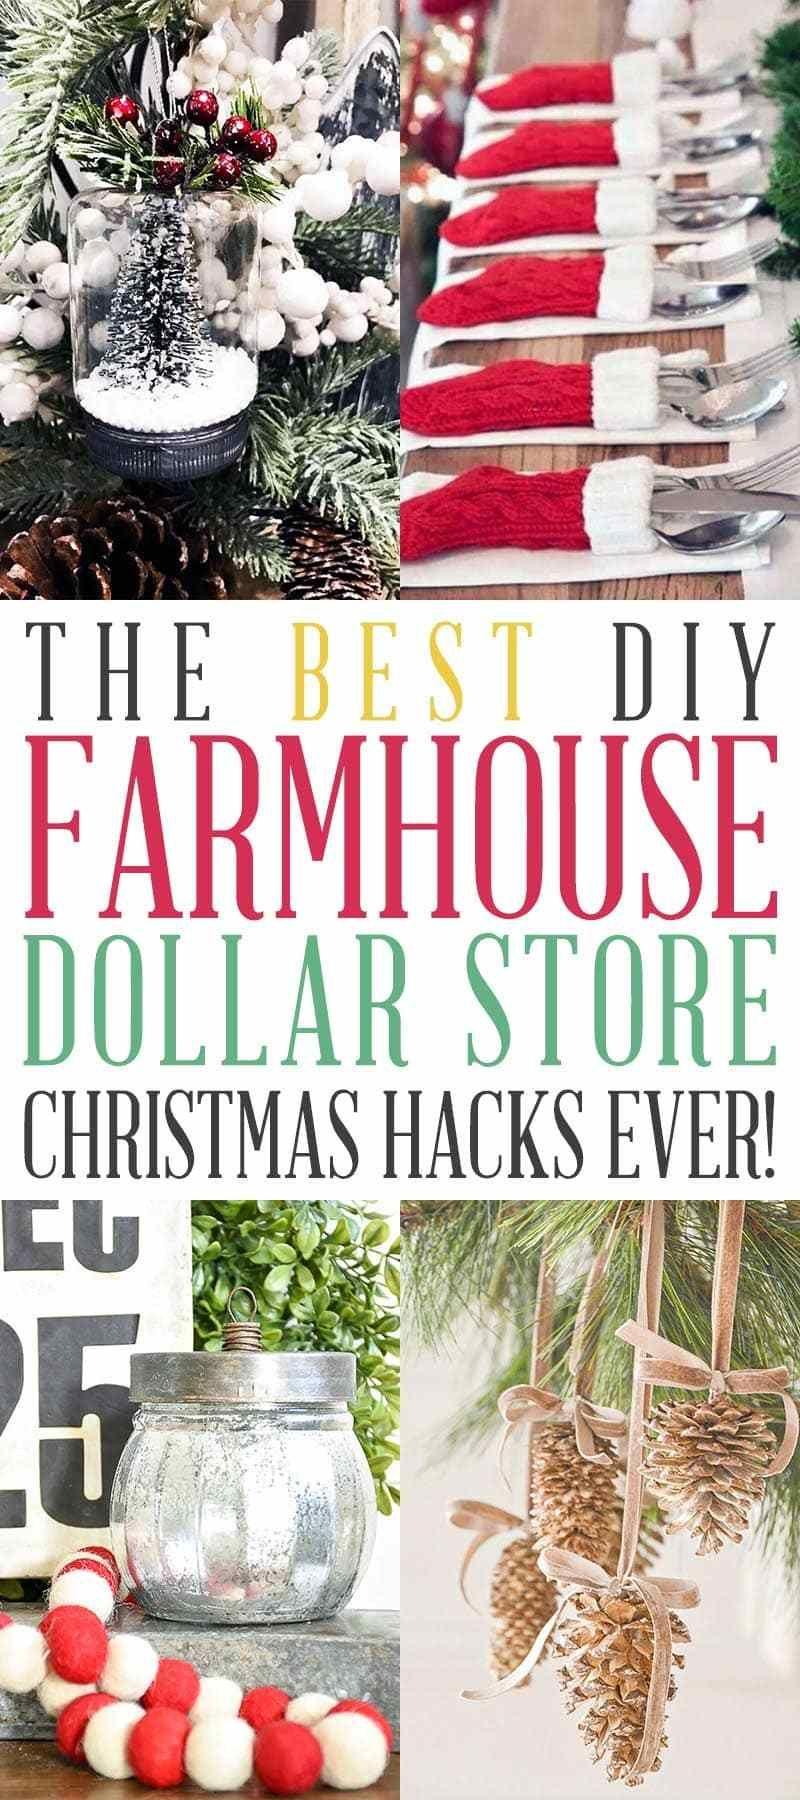 Photo of The Best DIY Farmhouse Dollar Store Christmas Hacks Ever!